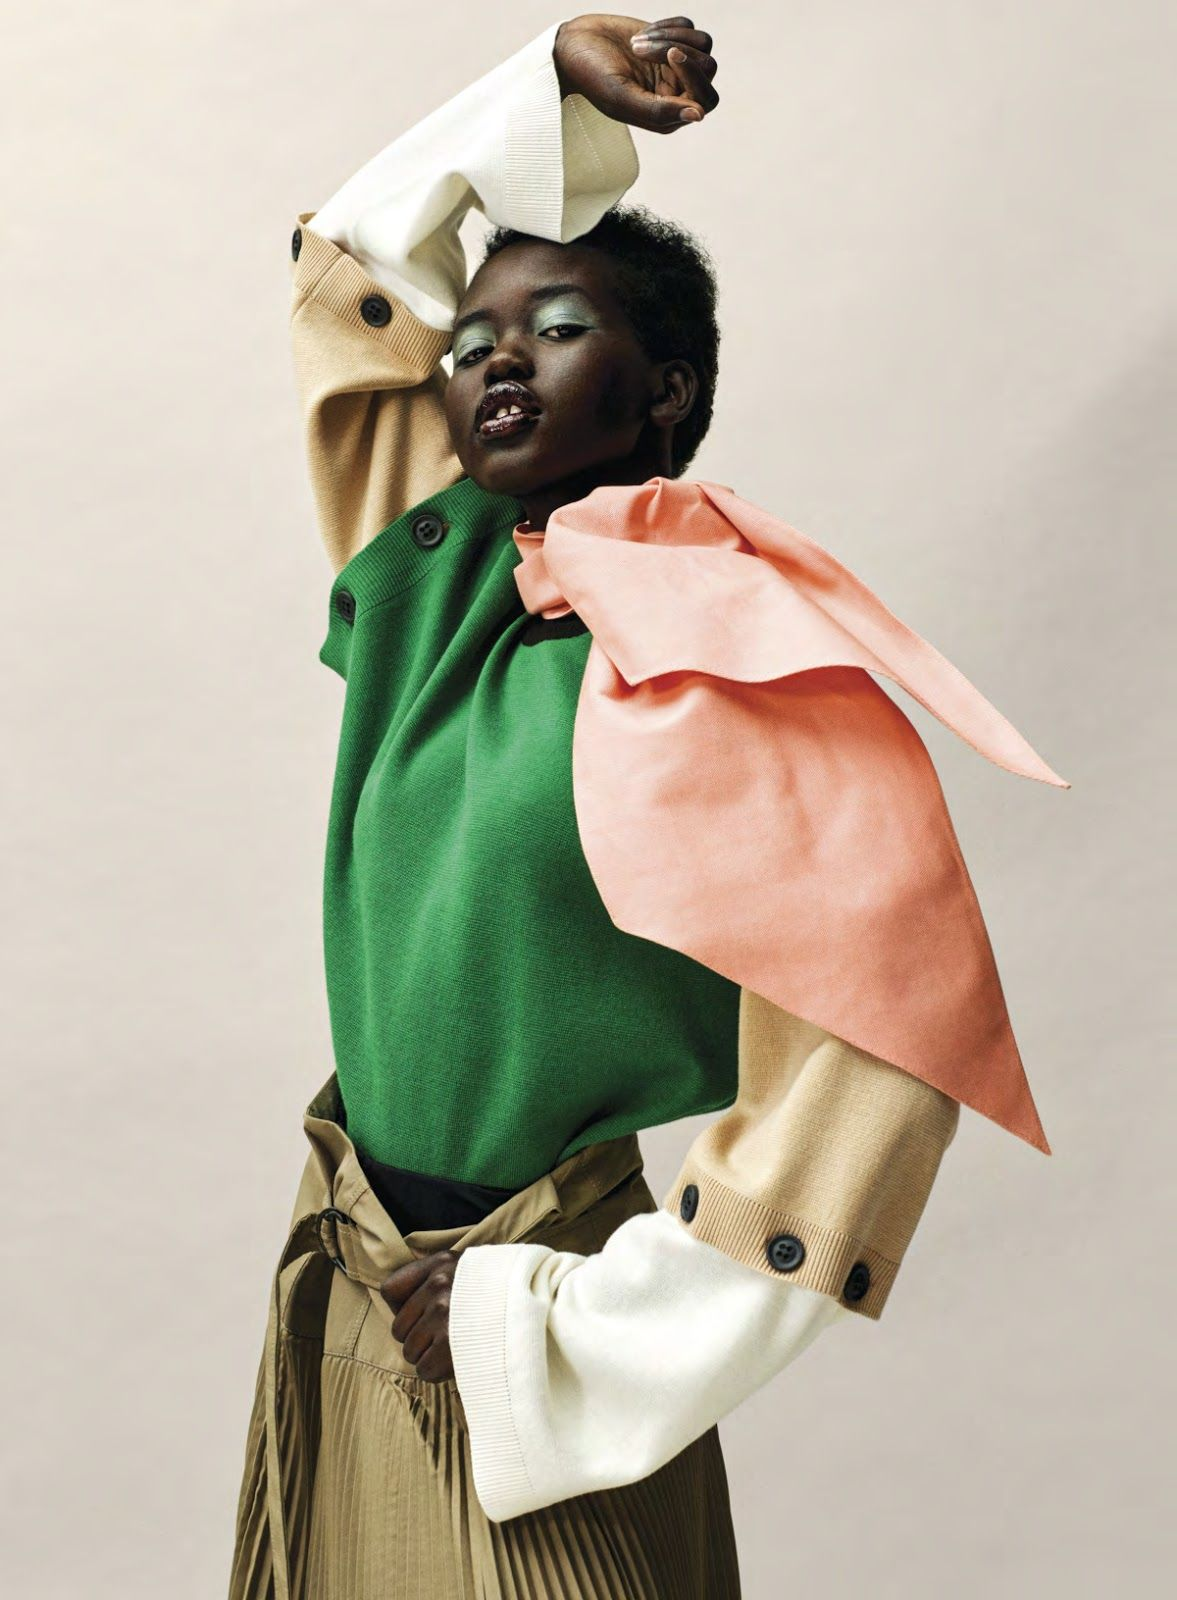 a990f8aee2b1 Adut Akech in Vogue USA January 2019 by Josh Olins